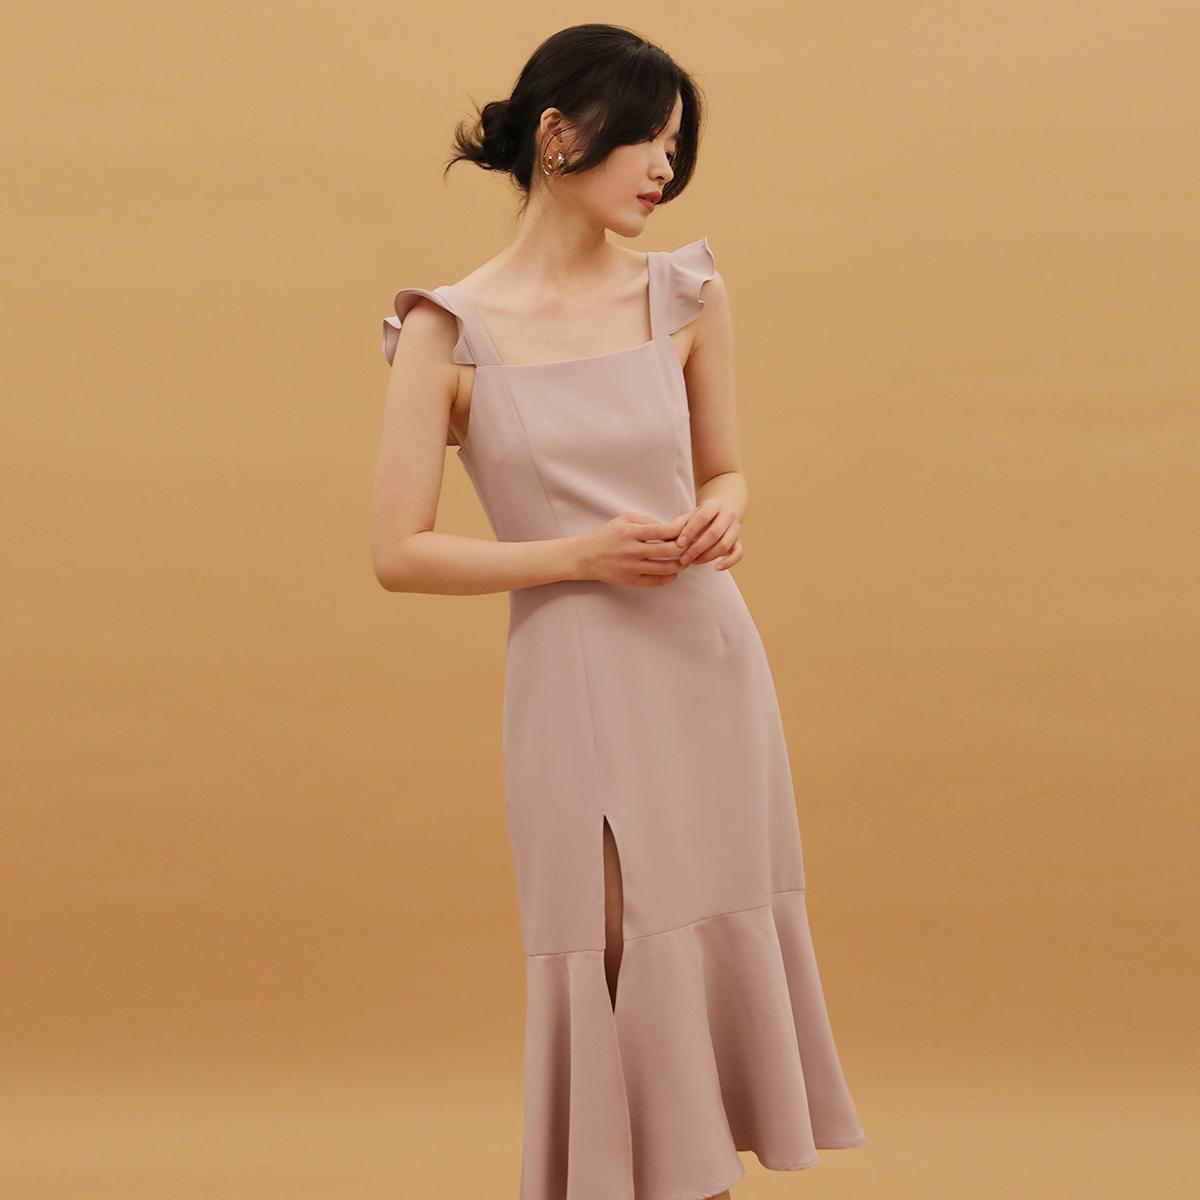 TANSSHOP新款2020连衣裙荷叶边吊带修身显瘦鱼尾开叉中长裙伴娘裙